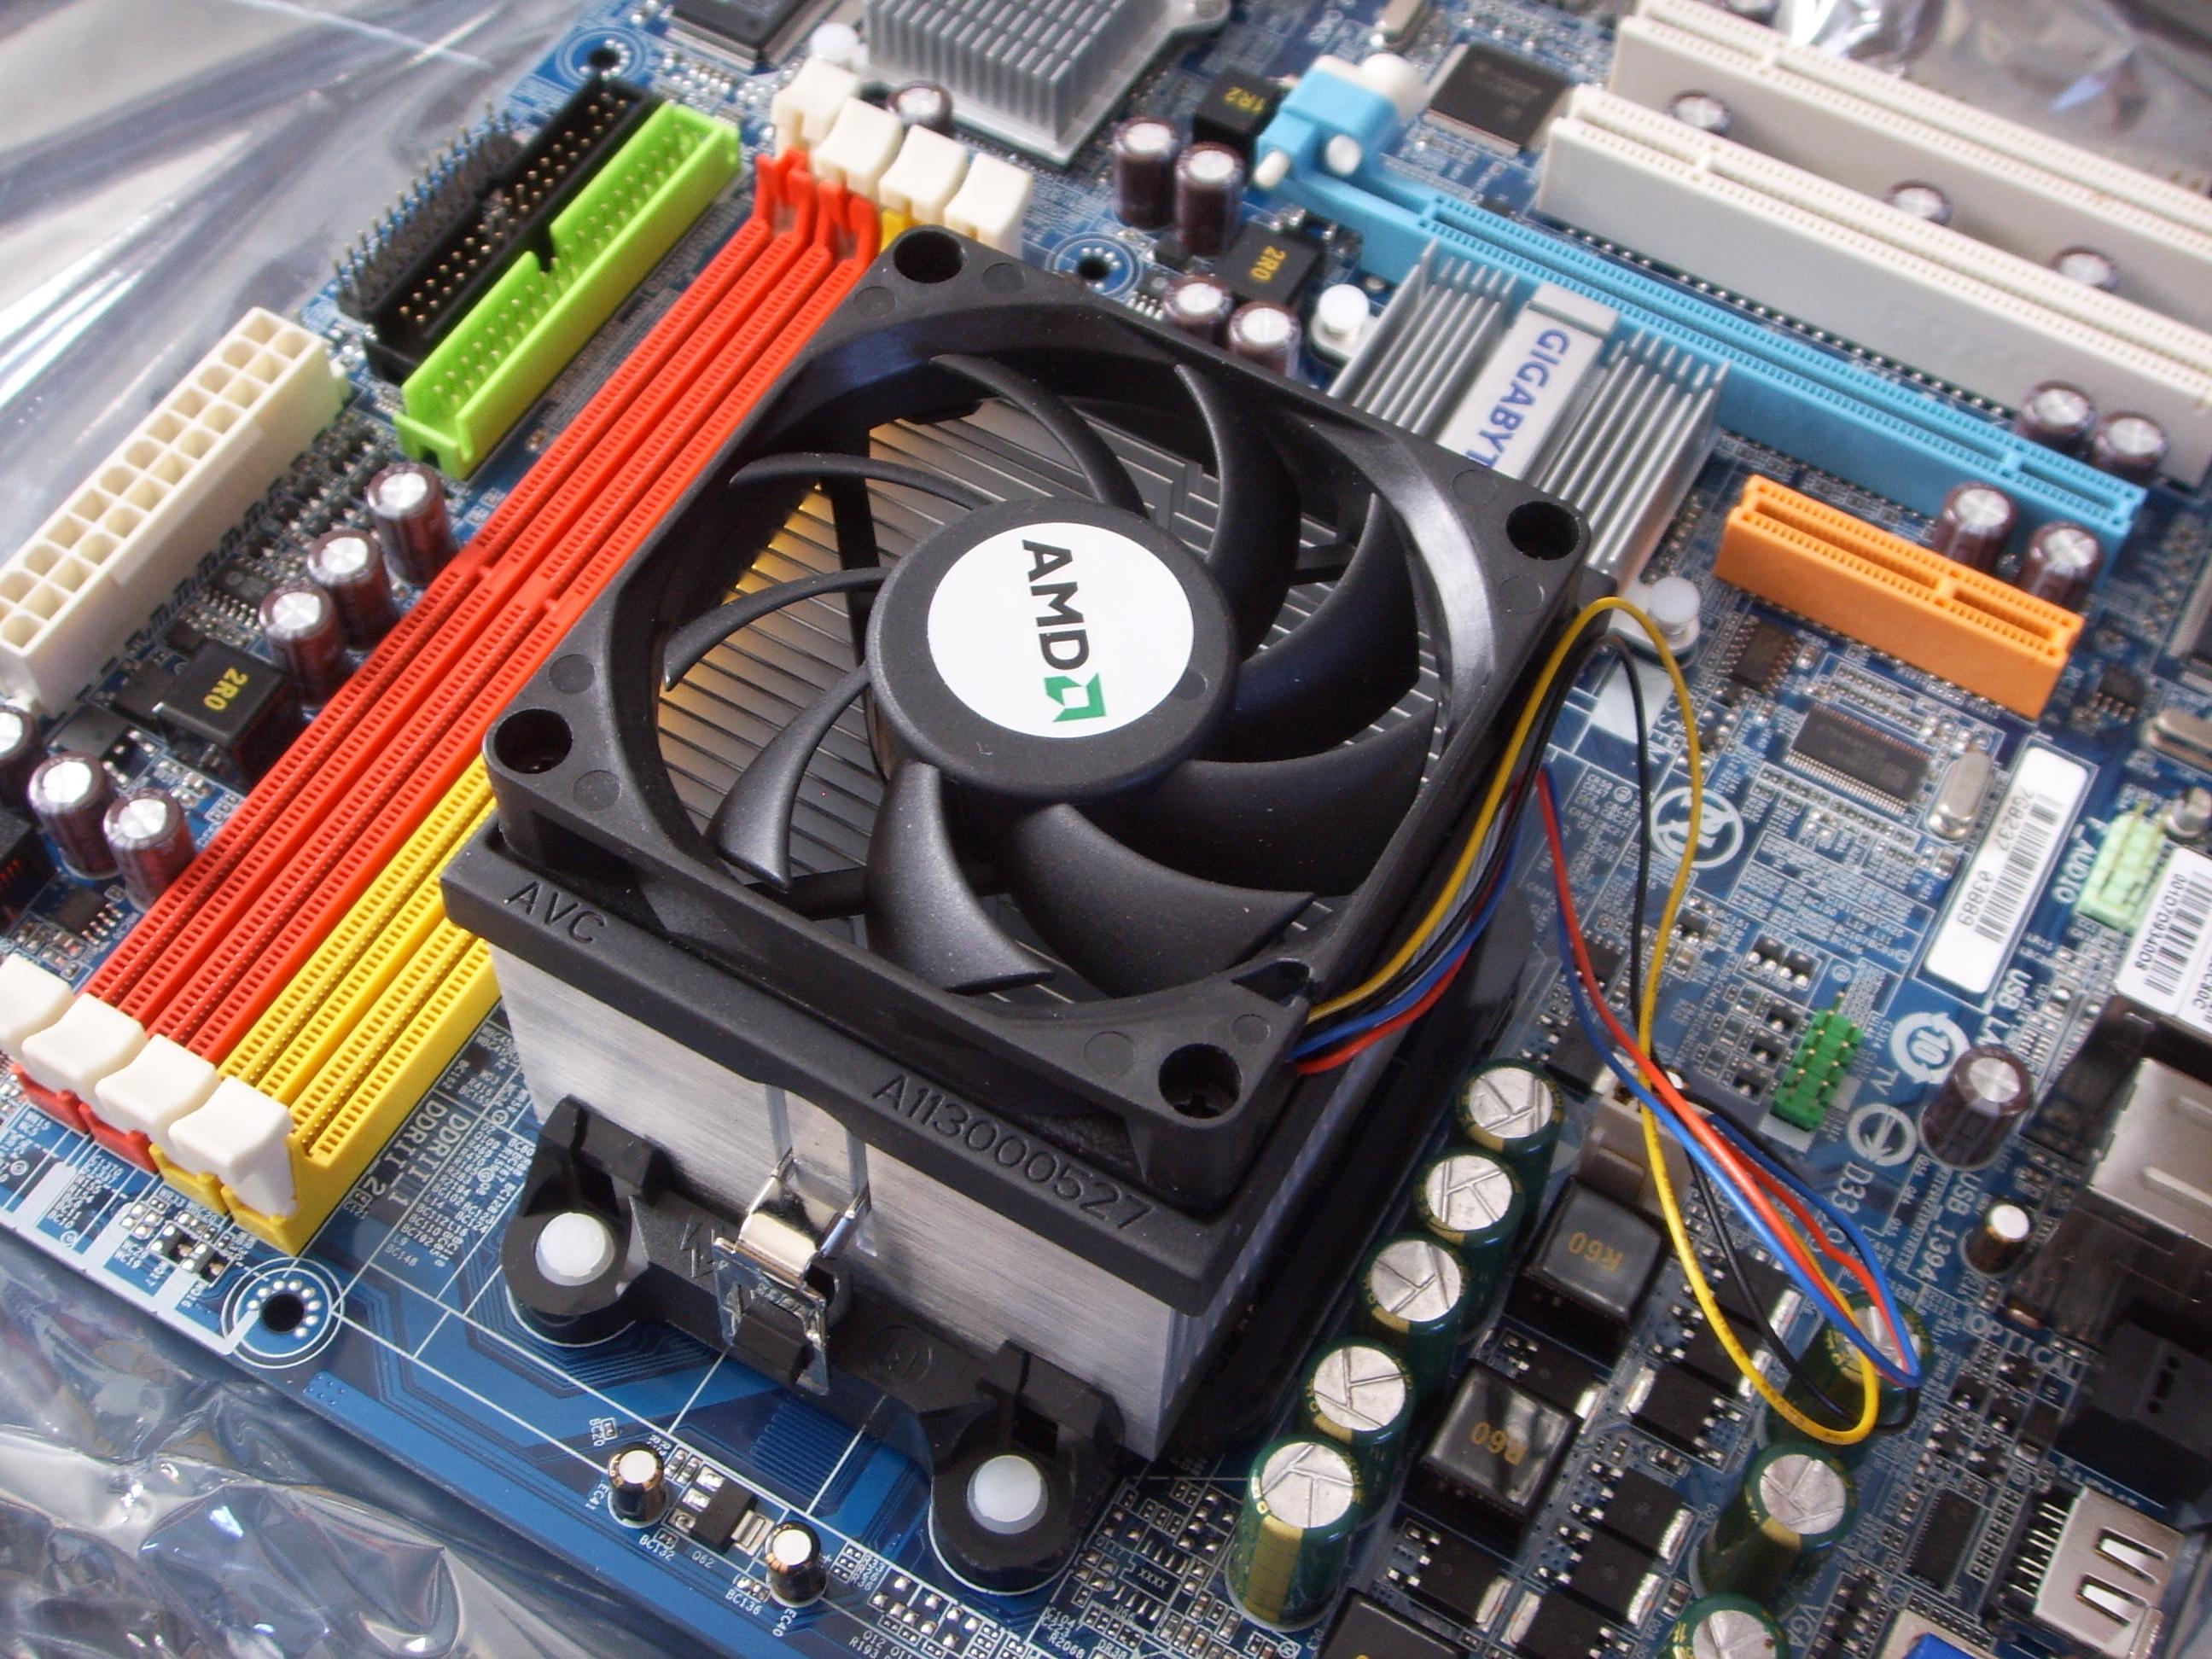 Amd athlon tm 64 x2 dual core processor audio